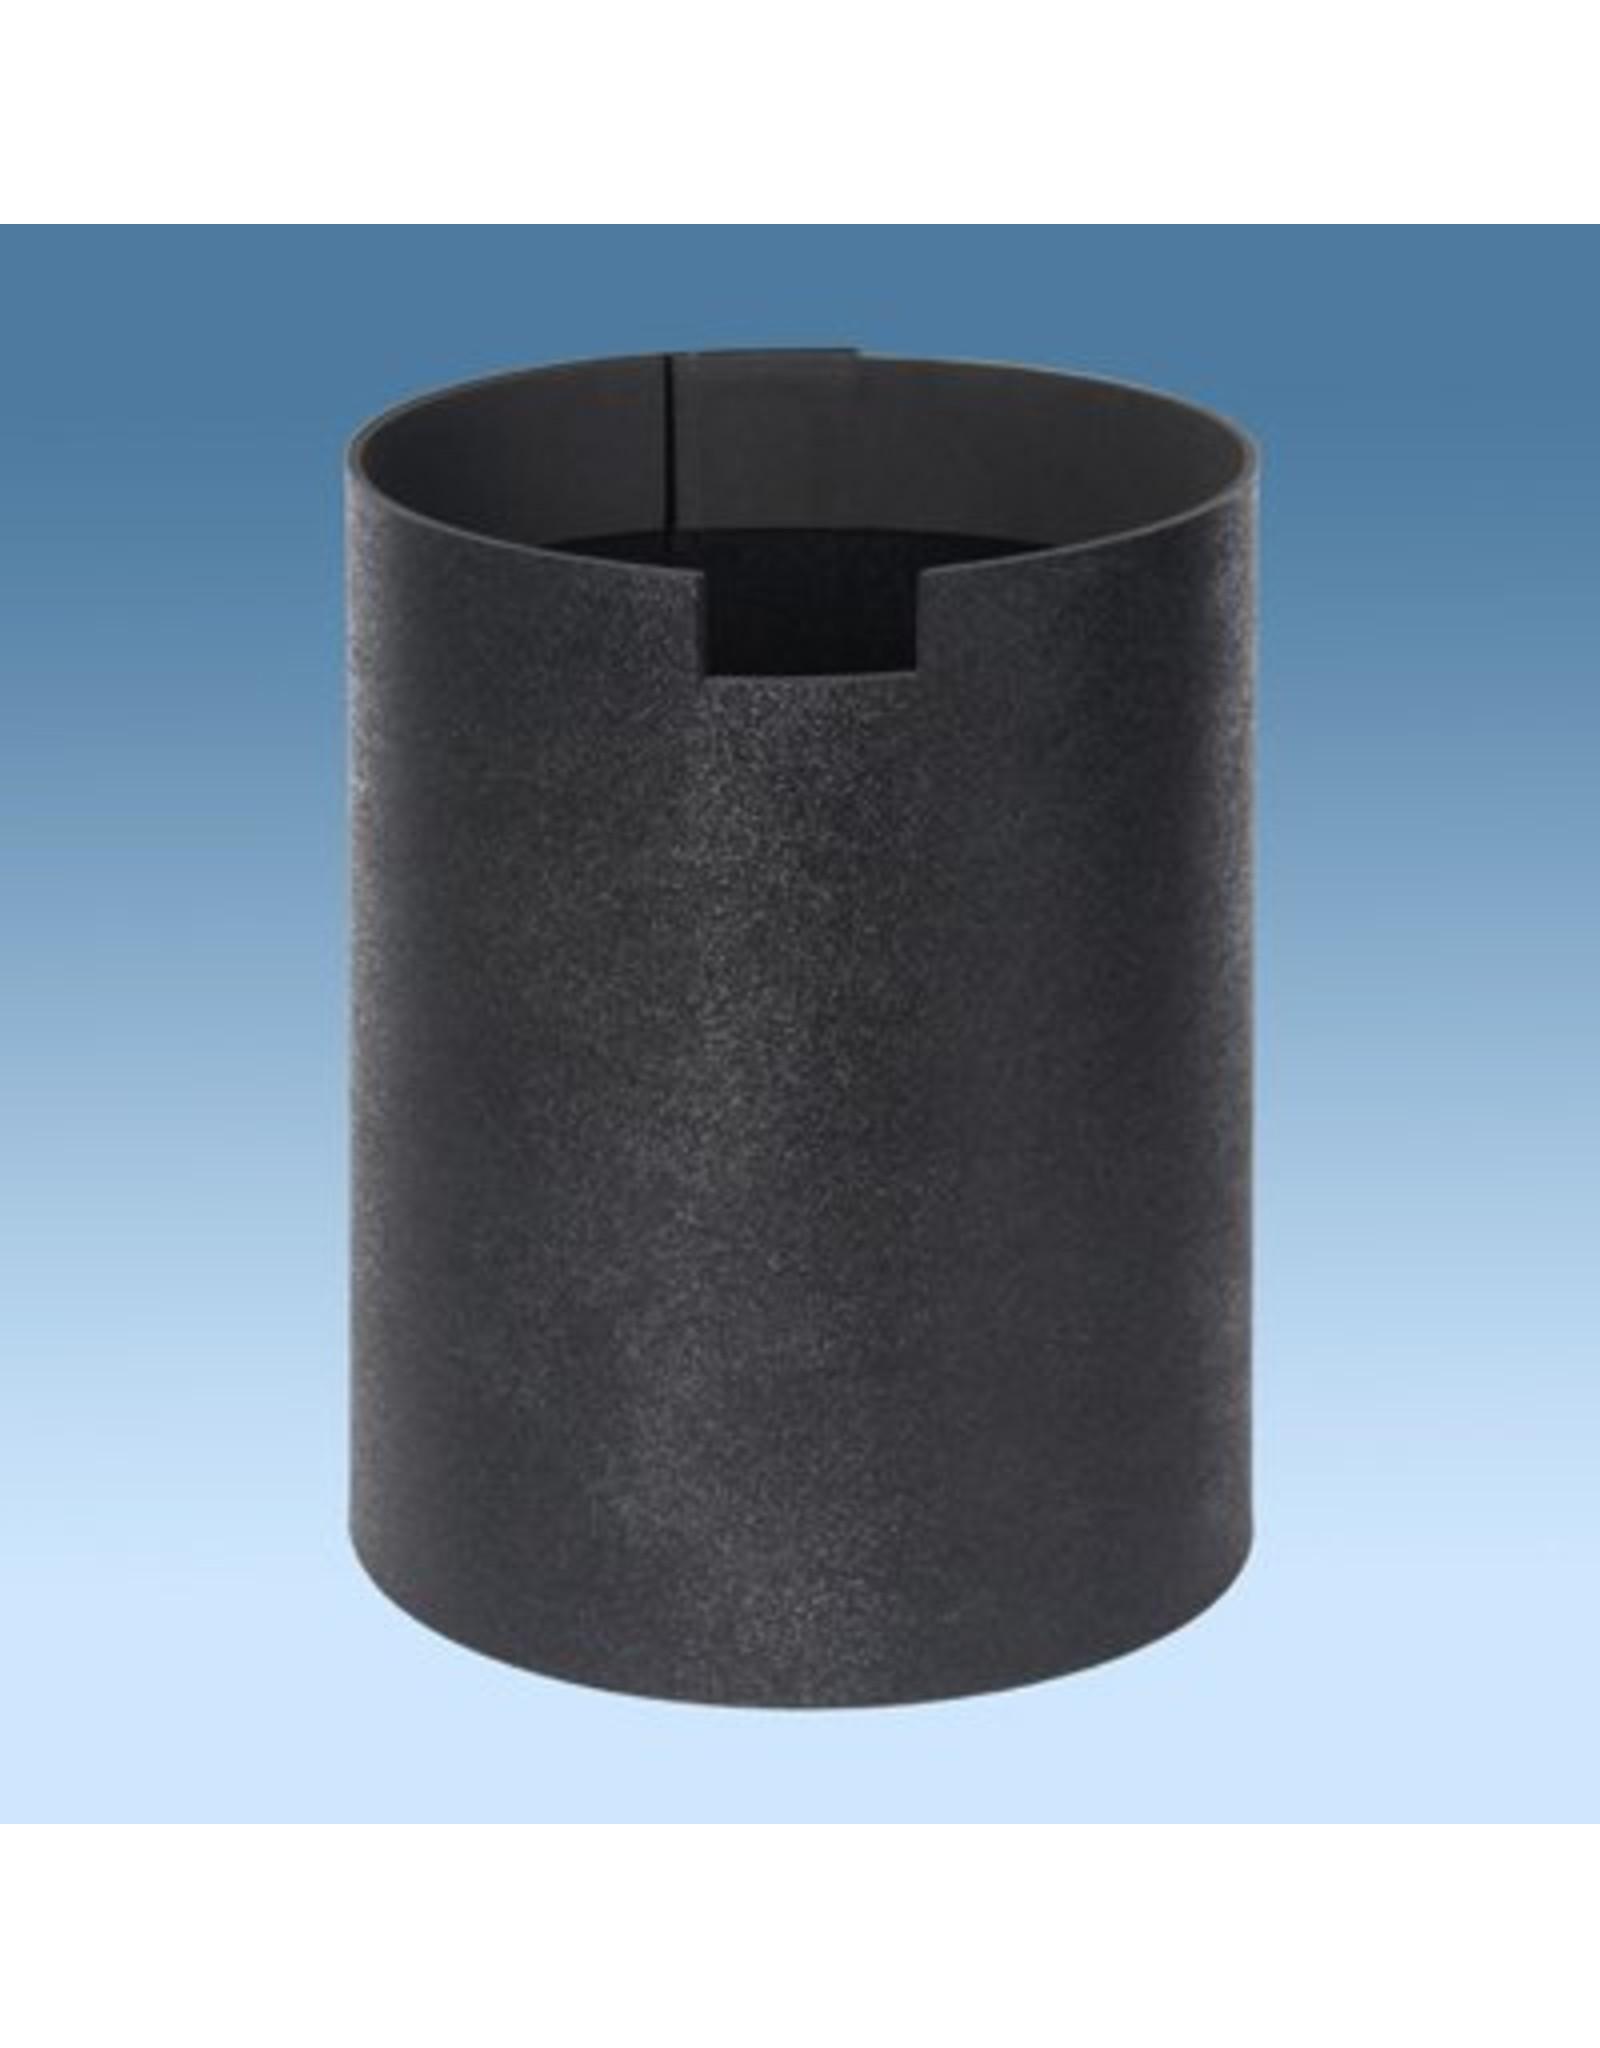 Astrozap Celestron NexStar 127 SLT MAK Flexi-Shield™ Flexible Dew Shield - with No Notches